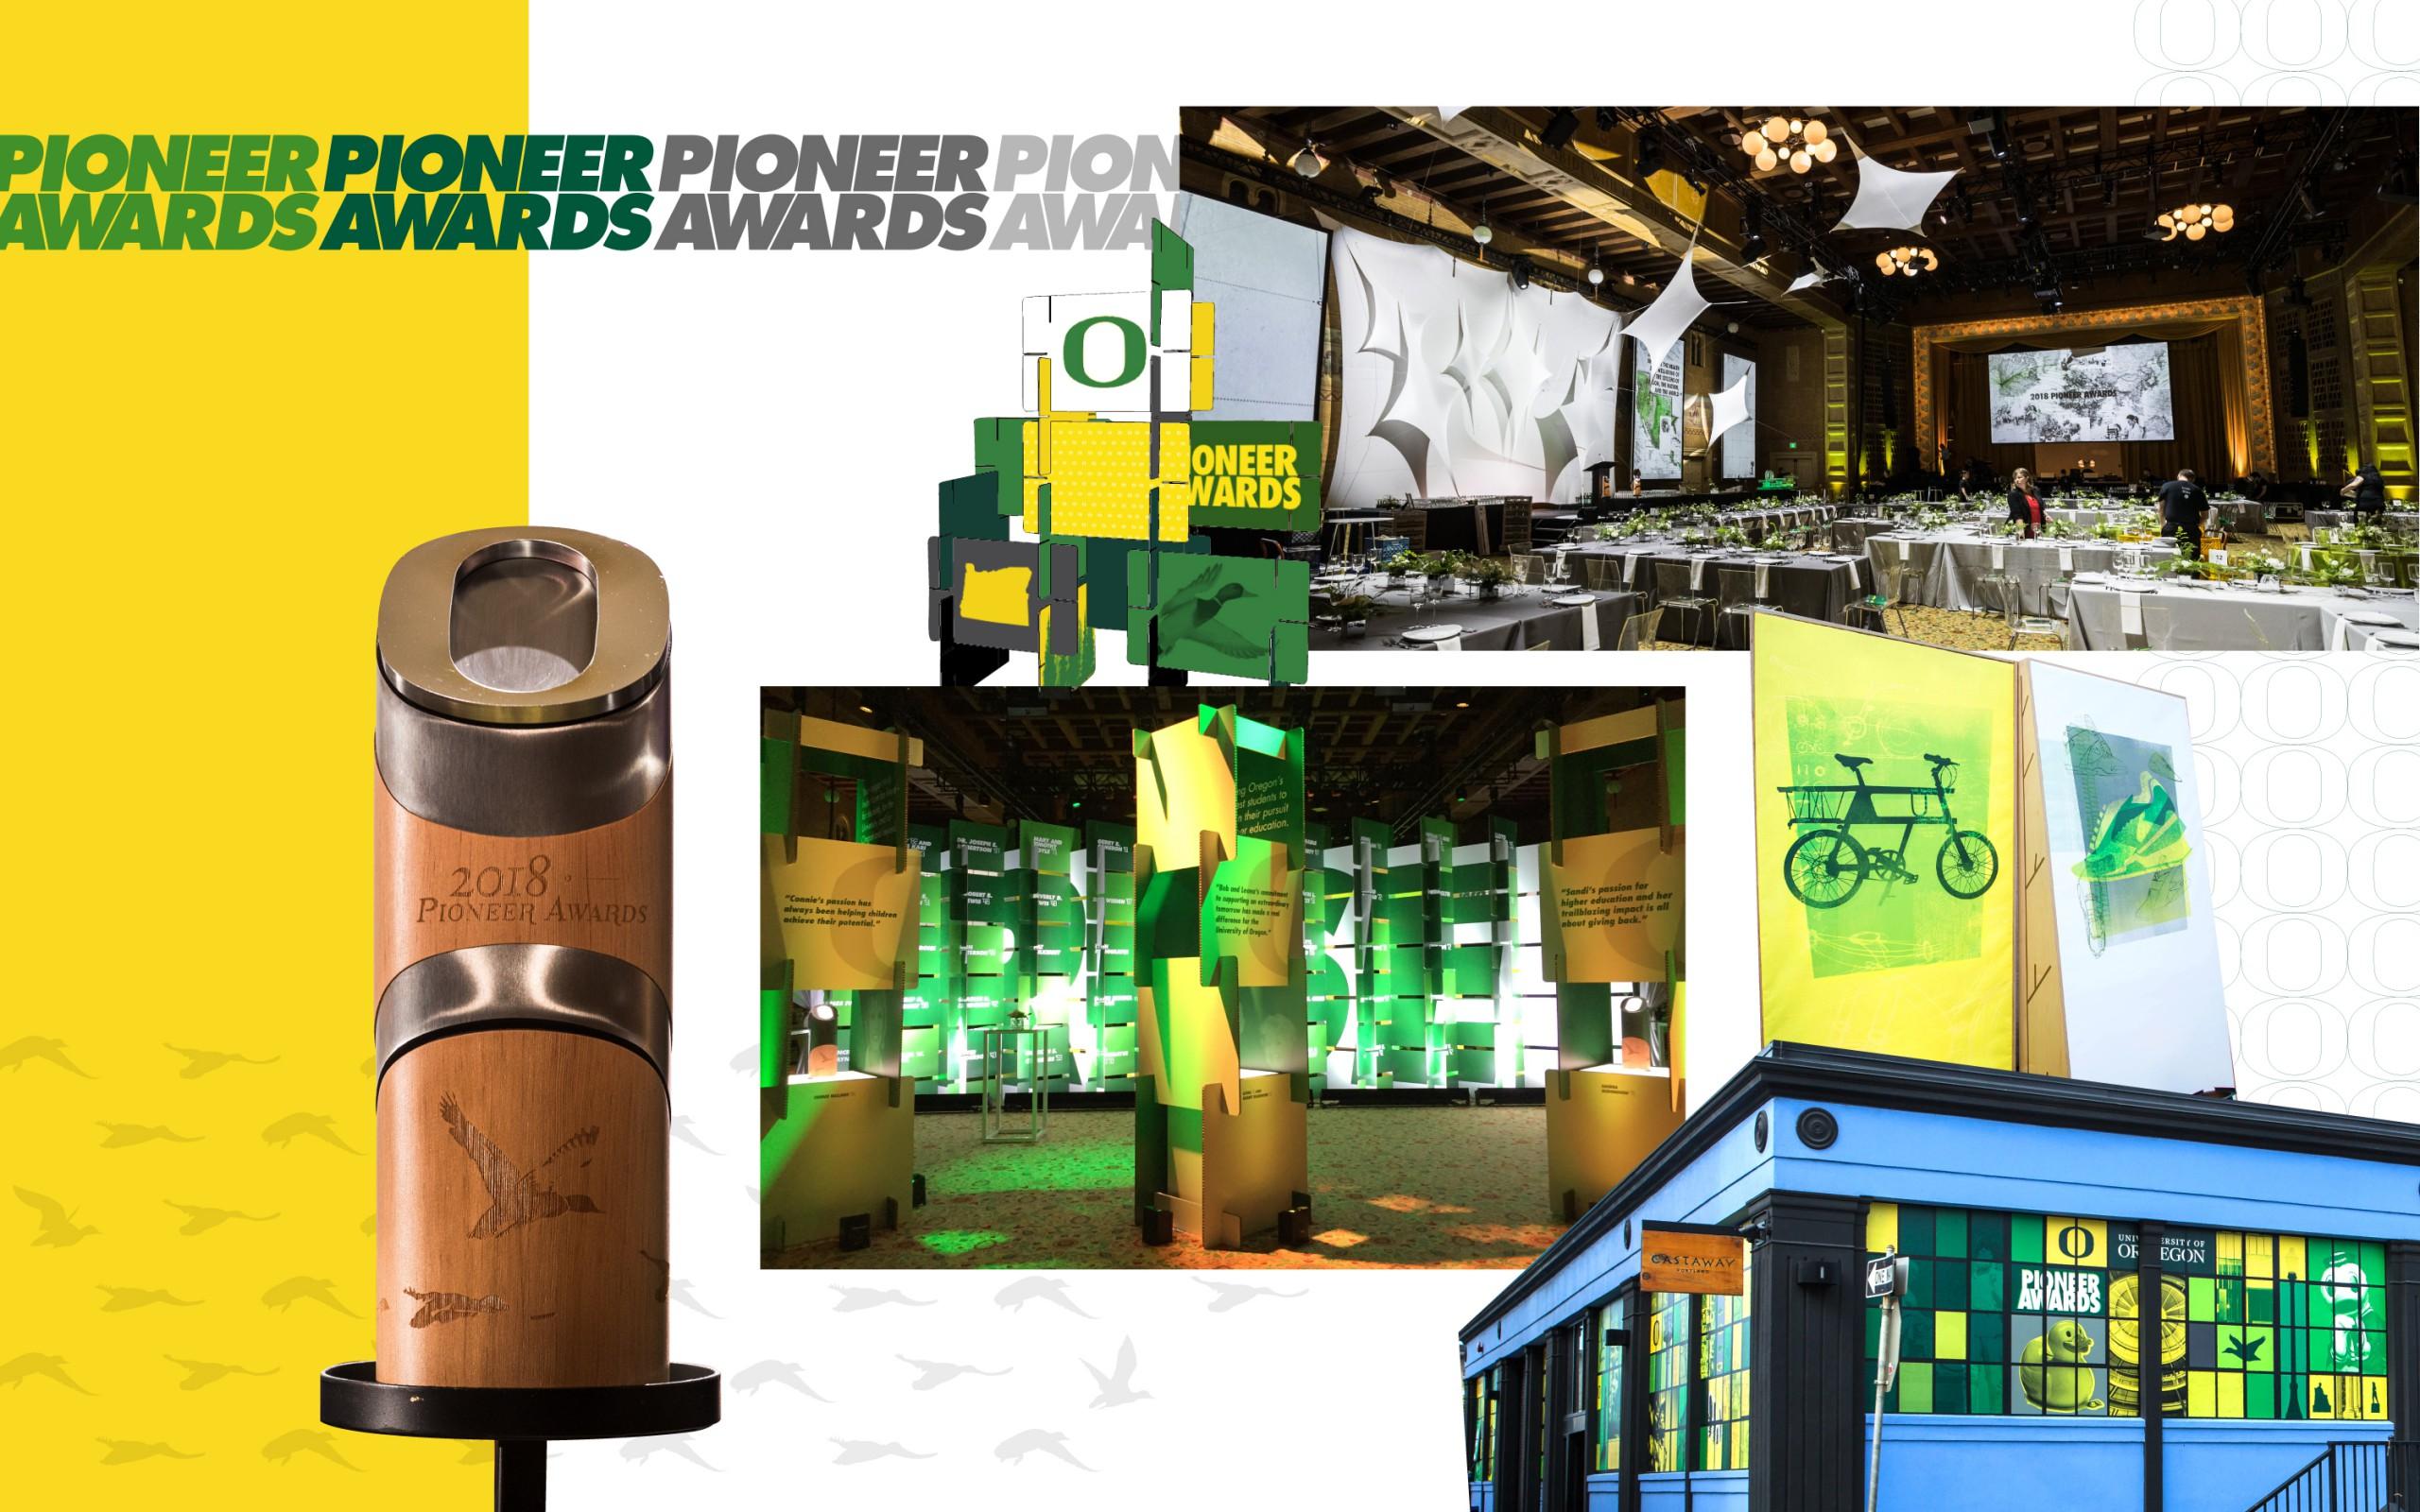 Pioneer Awards Visual Stylese